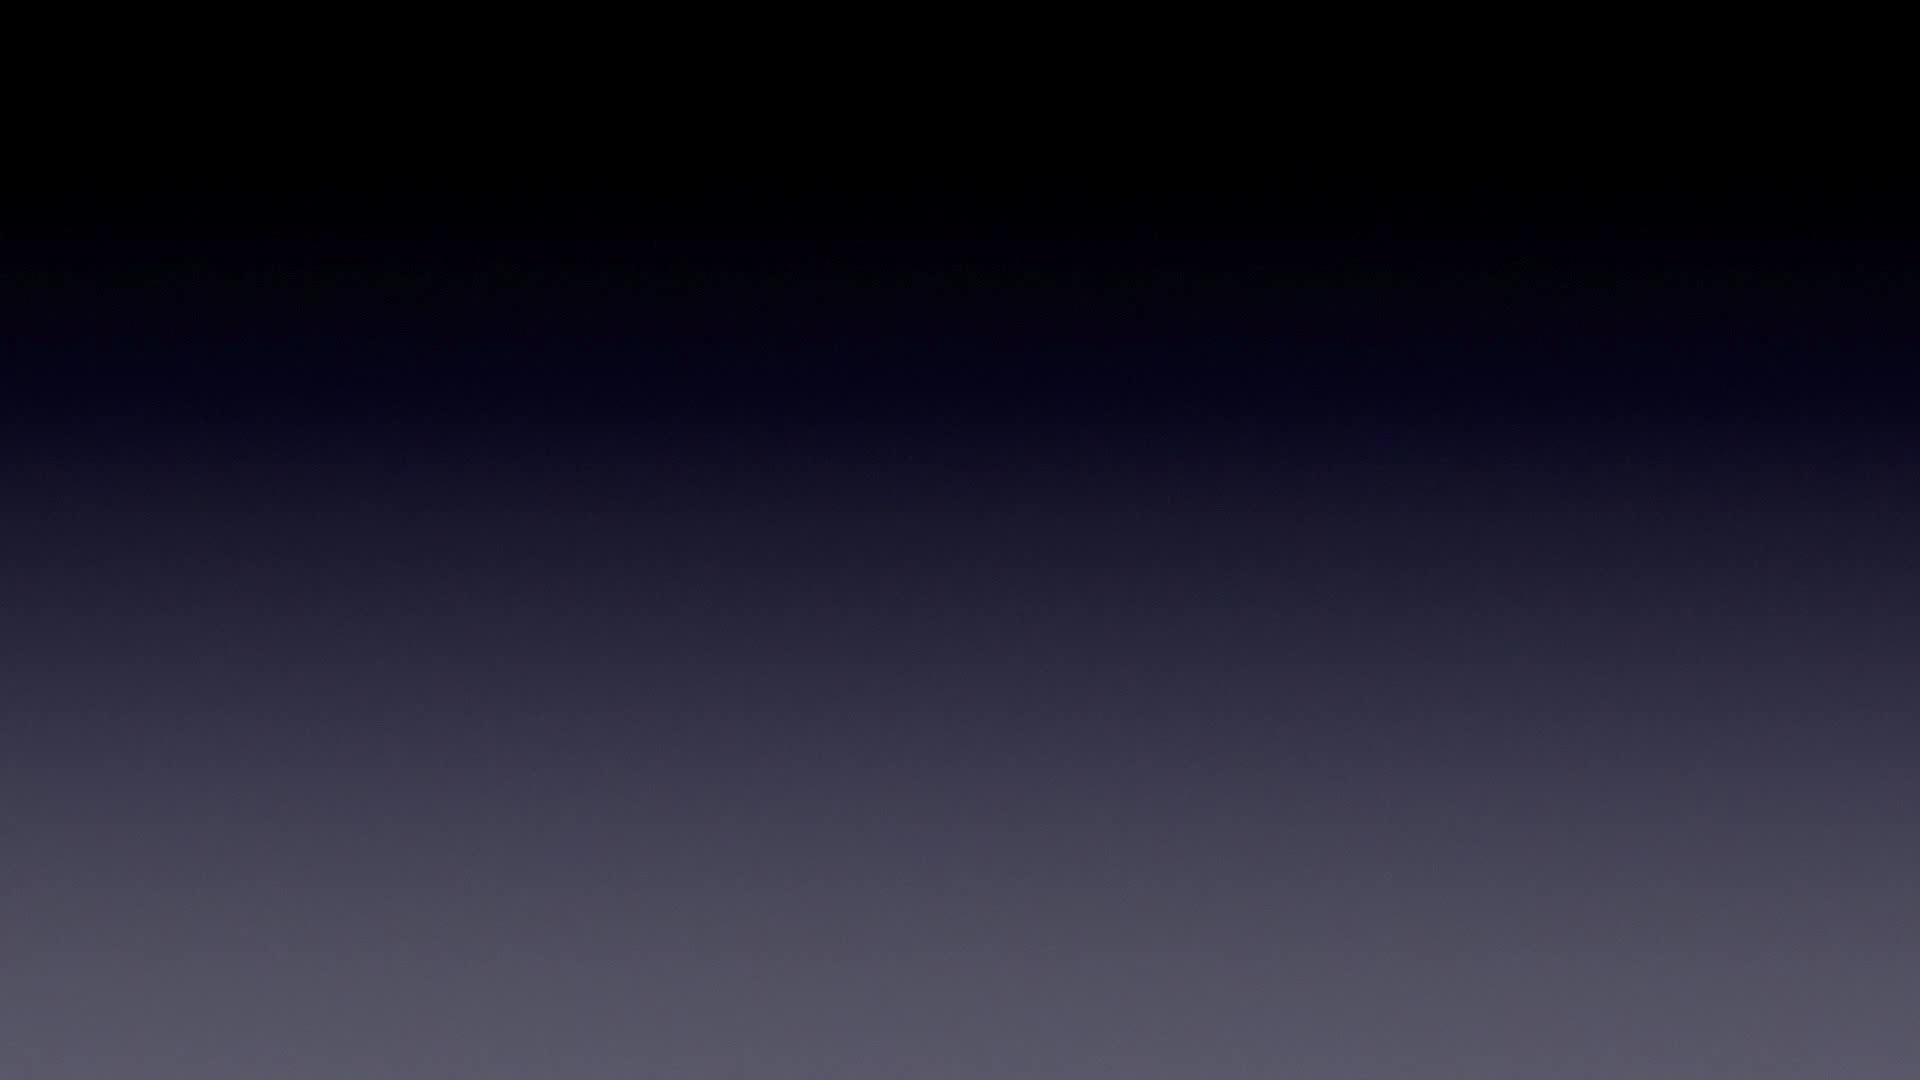 2017 गर्म बिक्री आरजीबी एलईडी पट्टी प्रकाश निविड़ अंधकार IP68 आरजीबी/RGBW एलईडी प्रकाश पट्टी